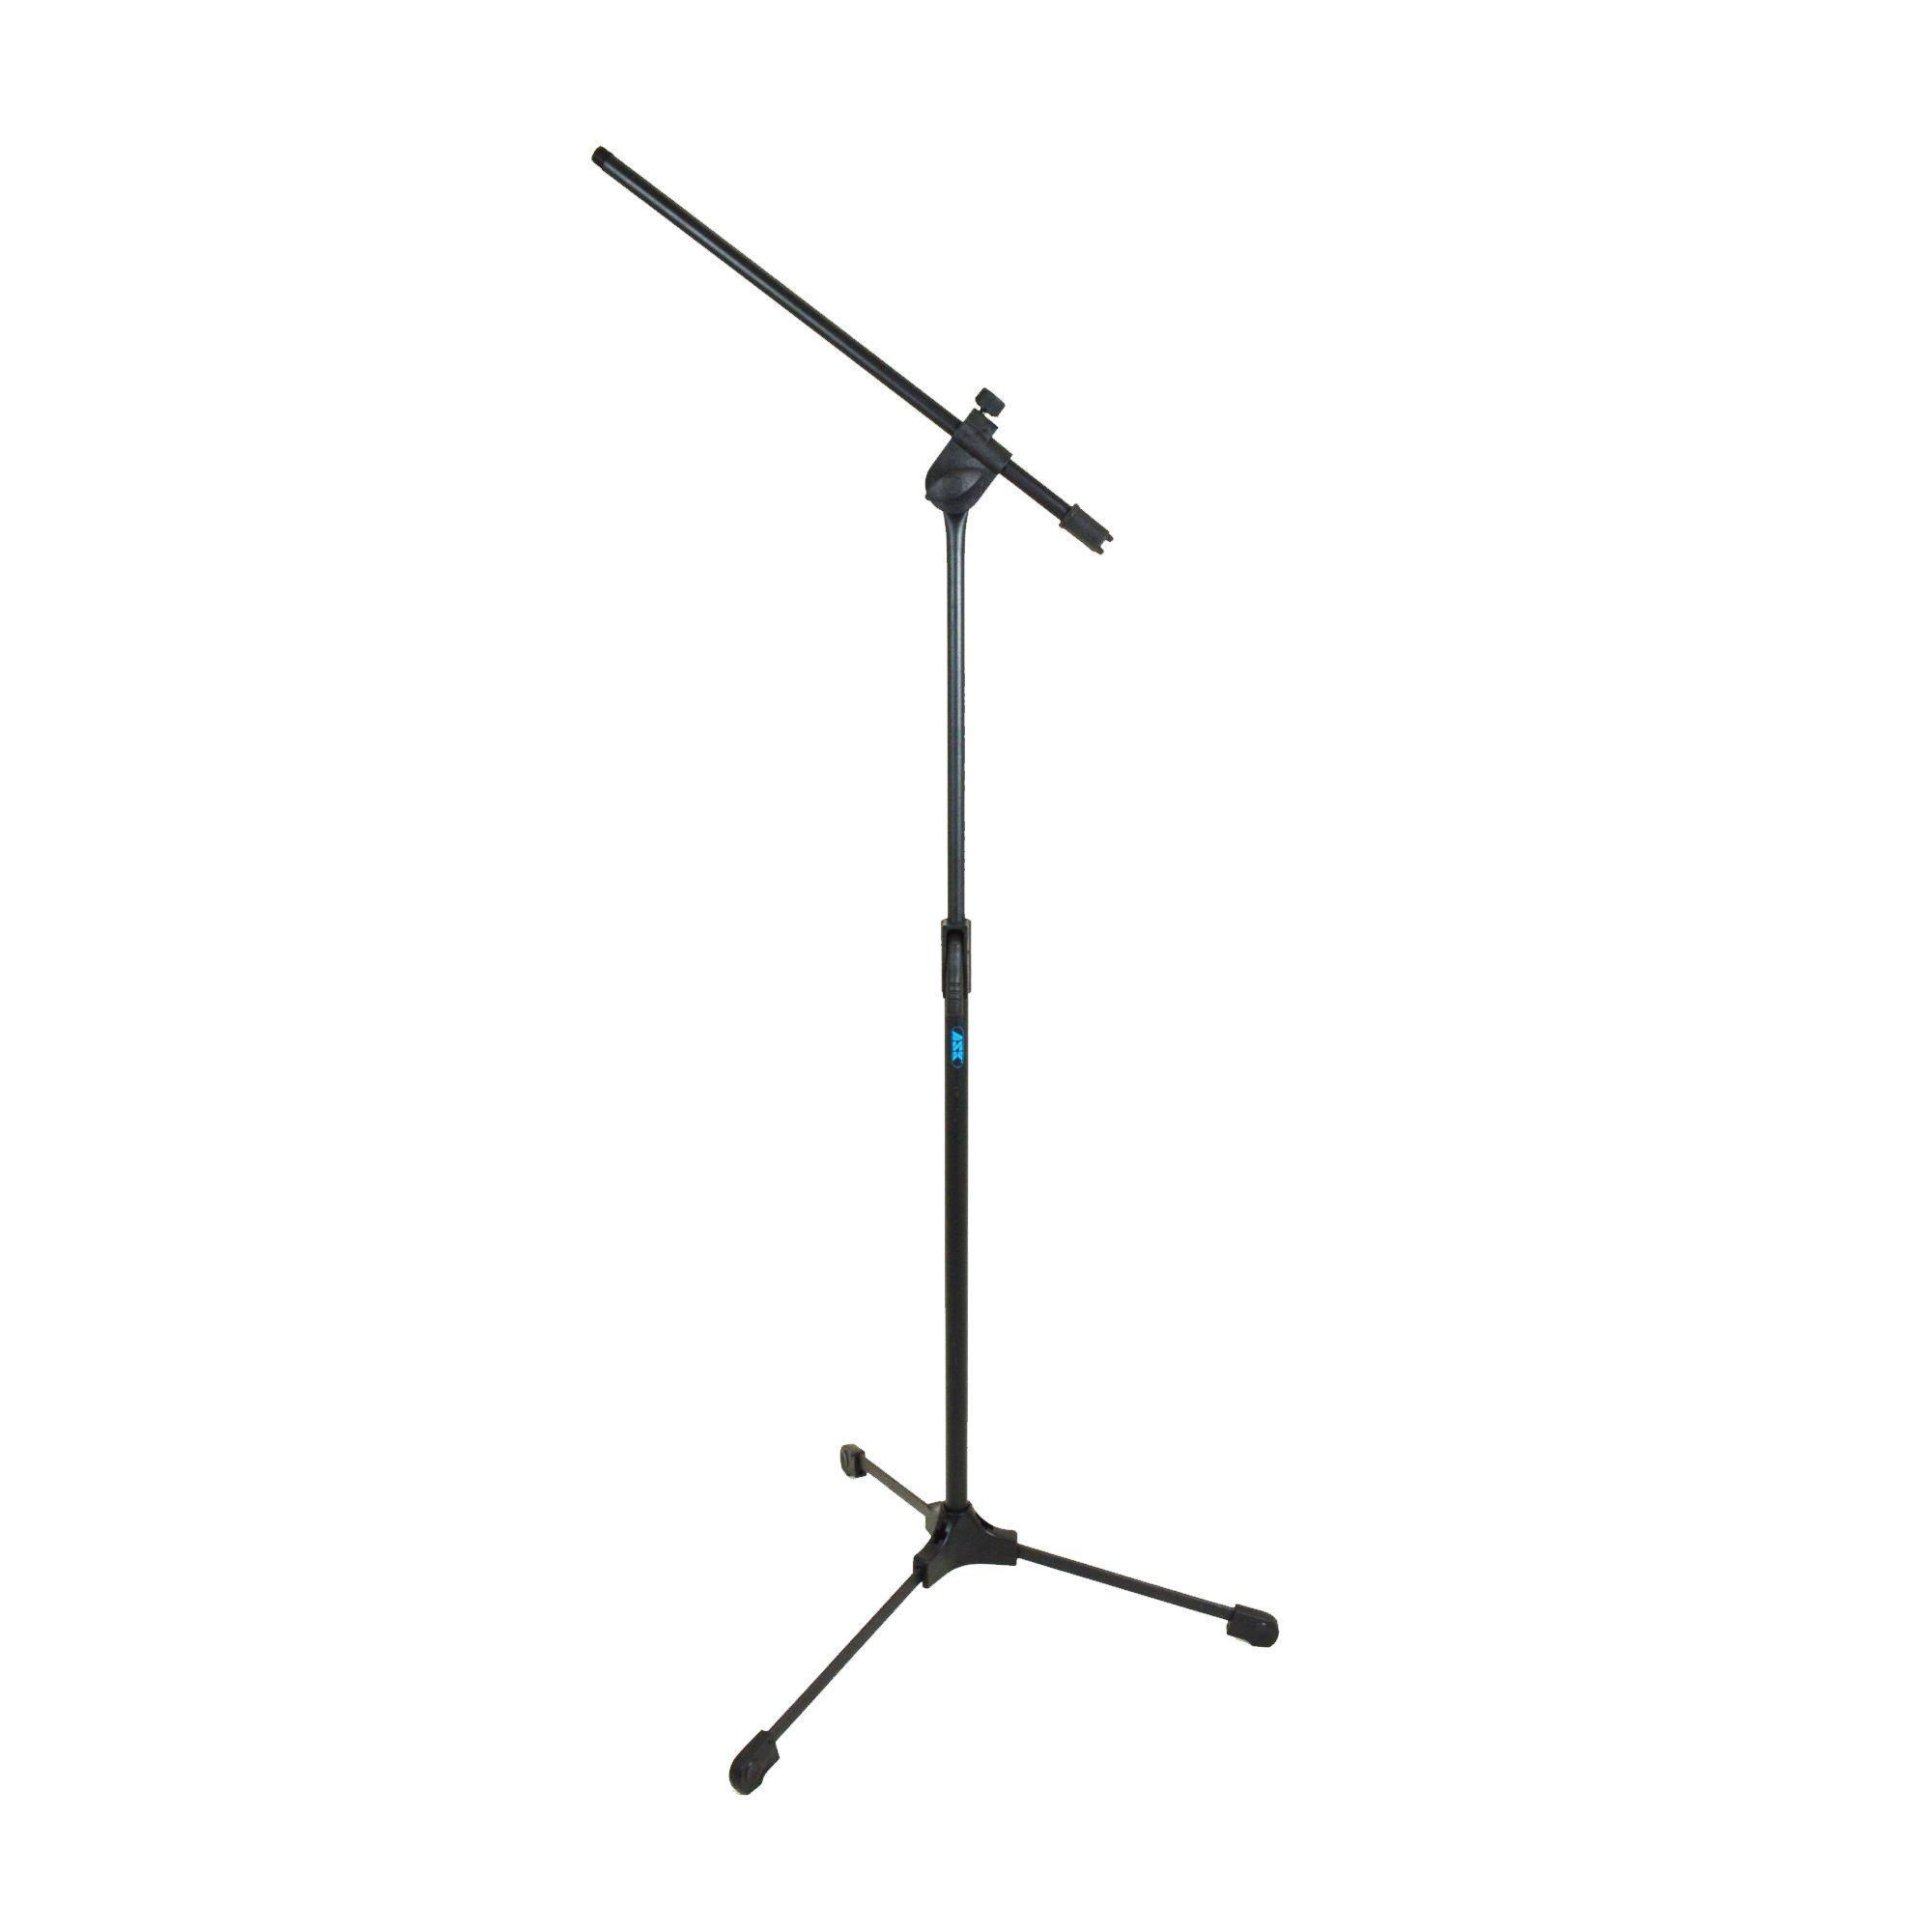 Suporte Pedestal Microfone Ask Universal Simples Tps